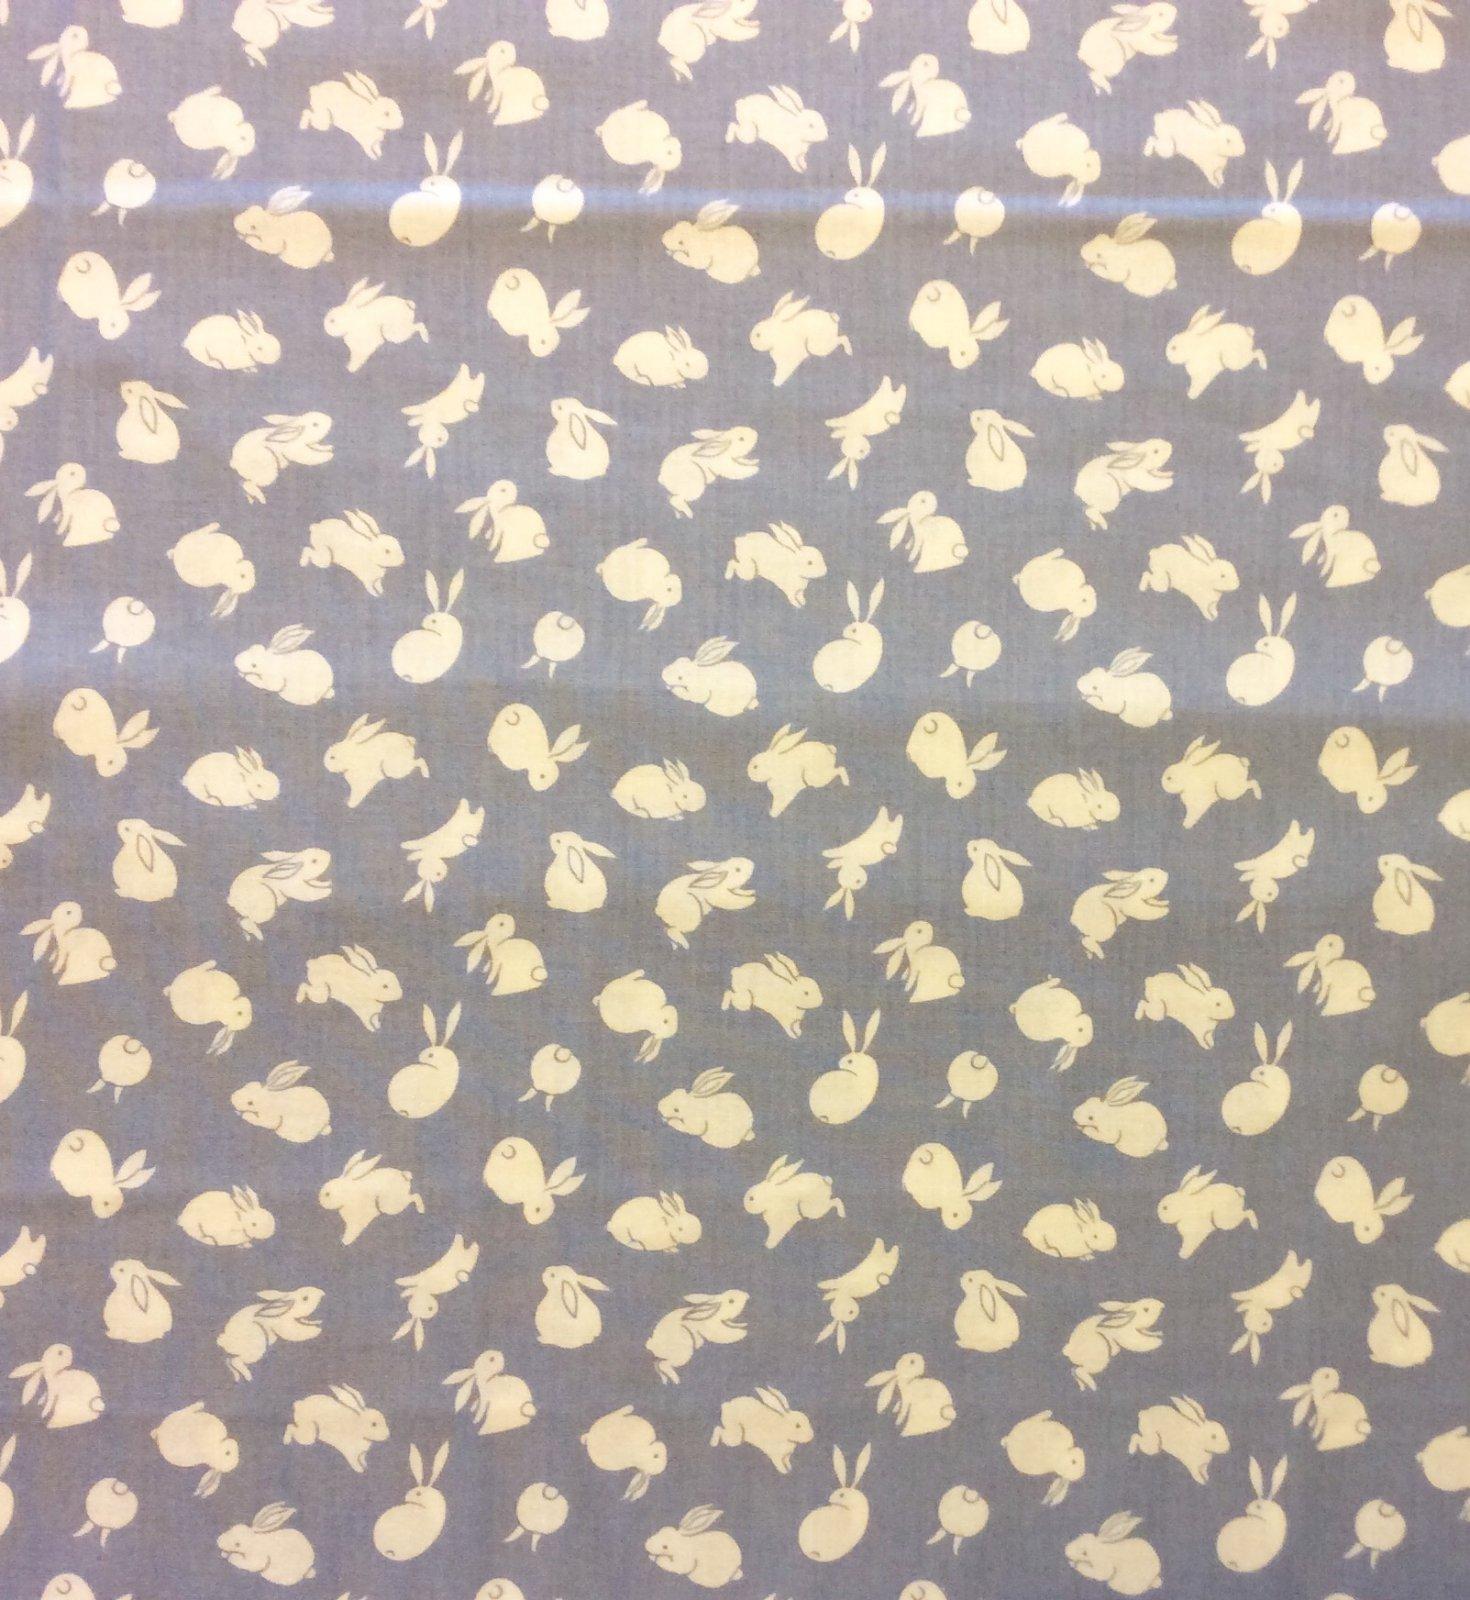 Cute Bunny Japanese Moon Rabbit Light Blue Cotton Quilt Fabric FT193